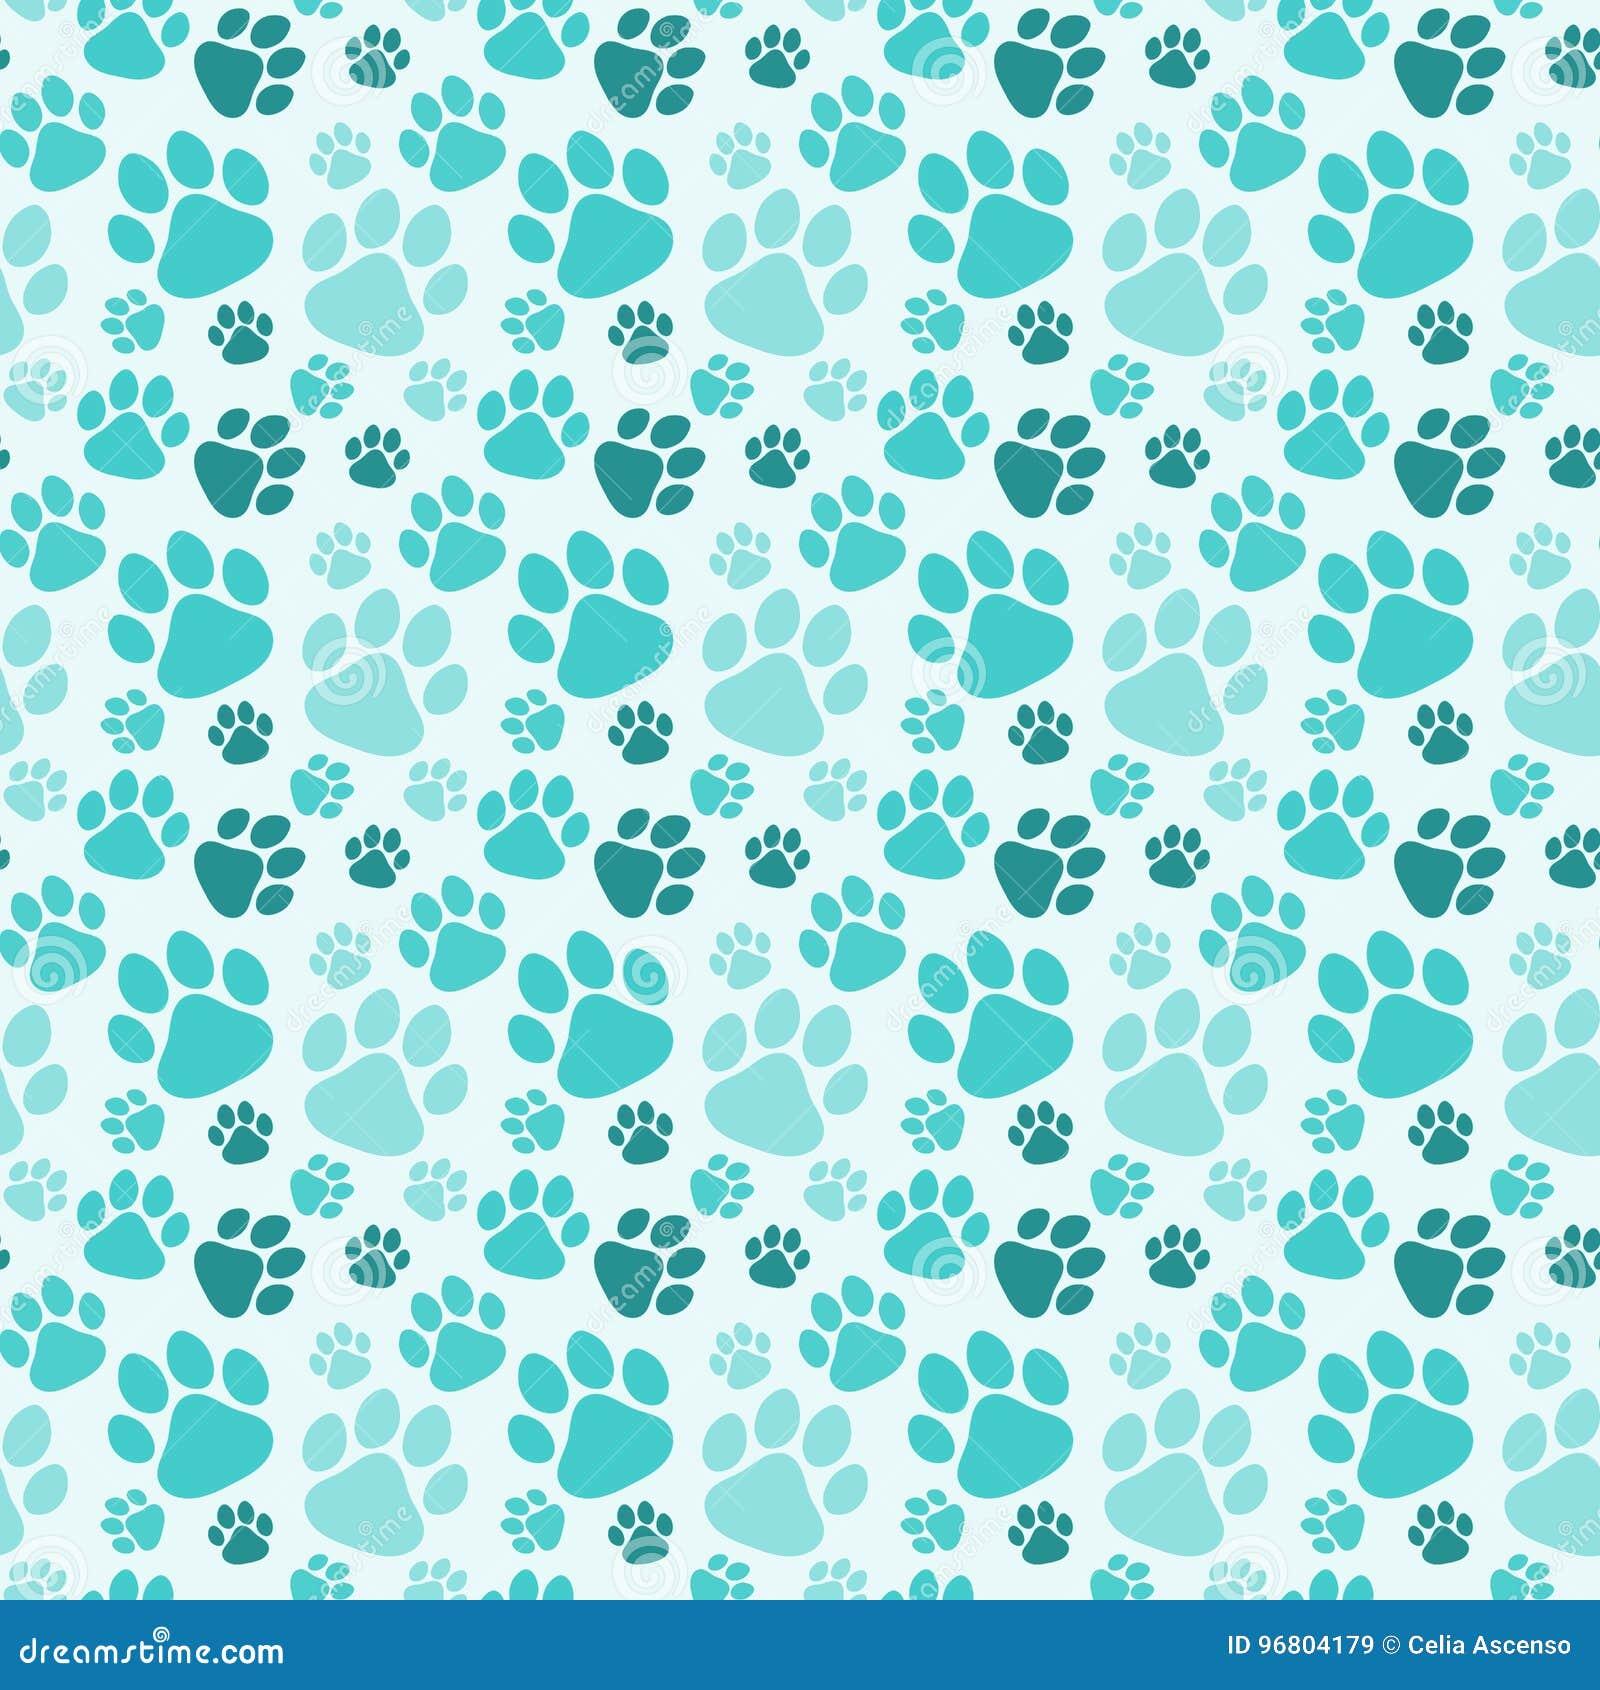 Paw prints background cartoon vector - Dog print wallpaper ...